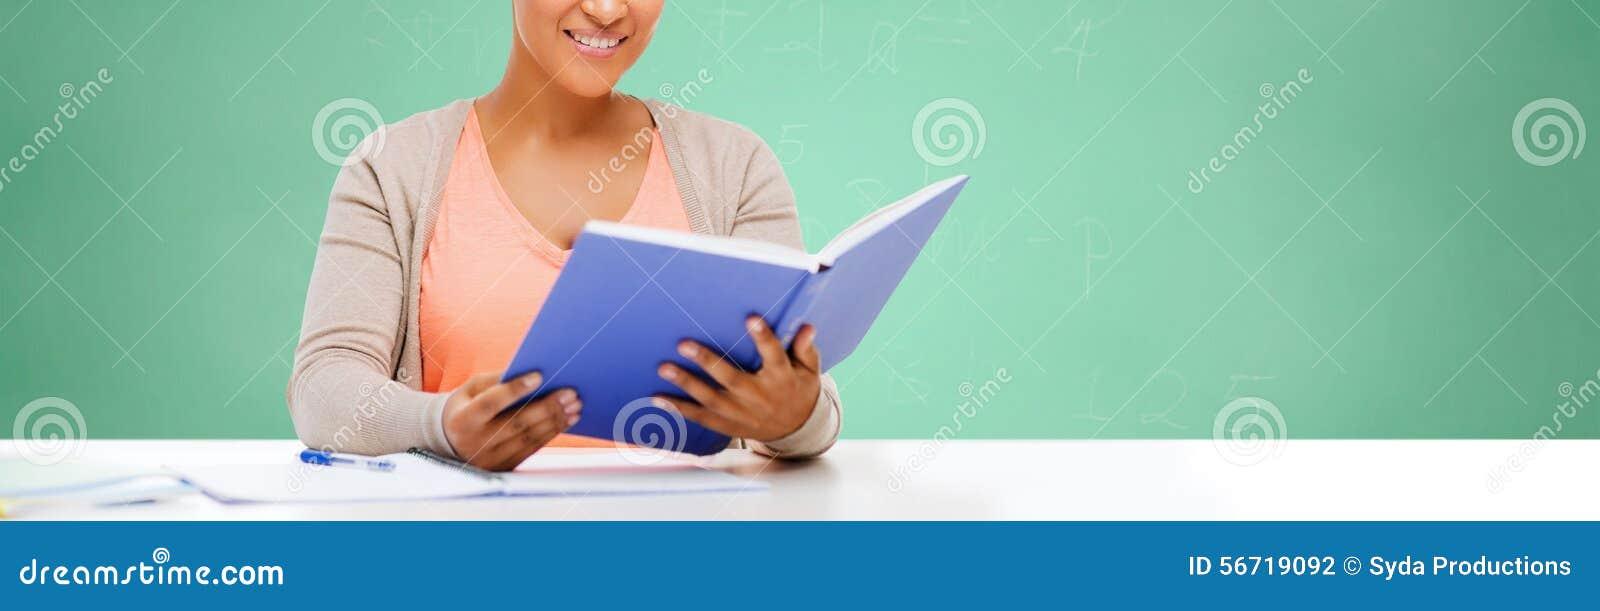 Afroes-amerikanisch Studentenmädchen-Lesebuch in der Schule